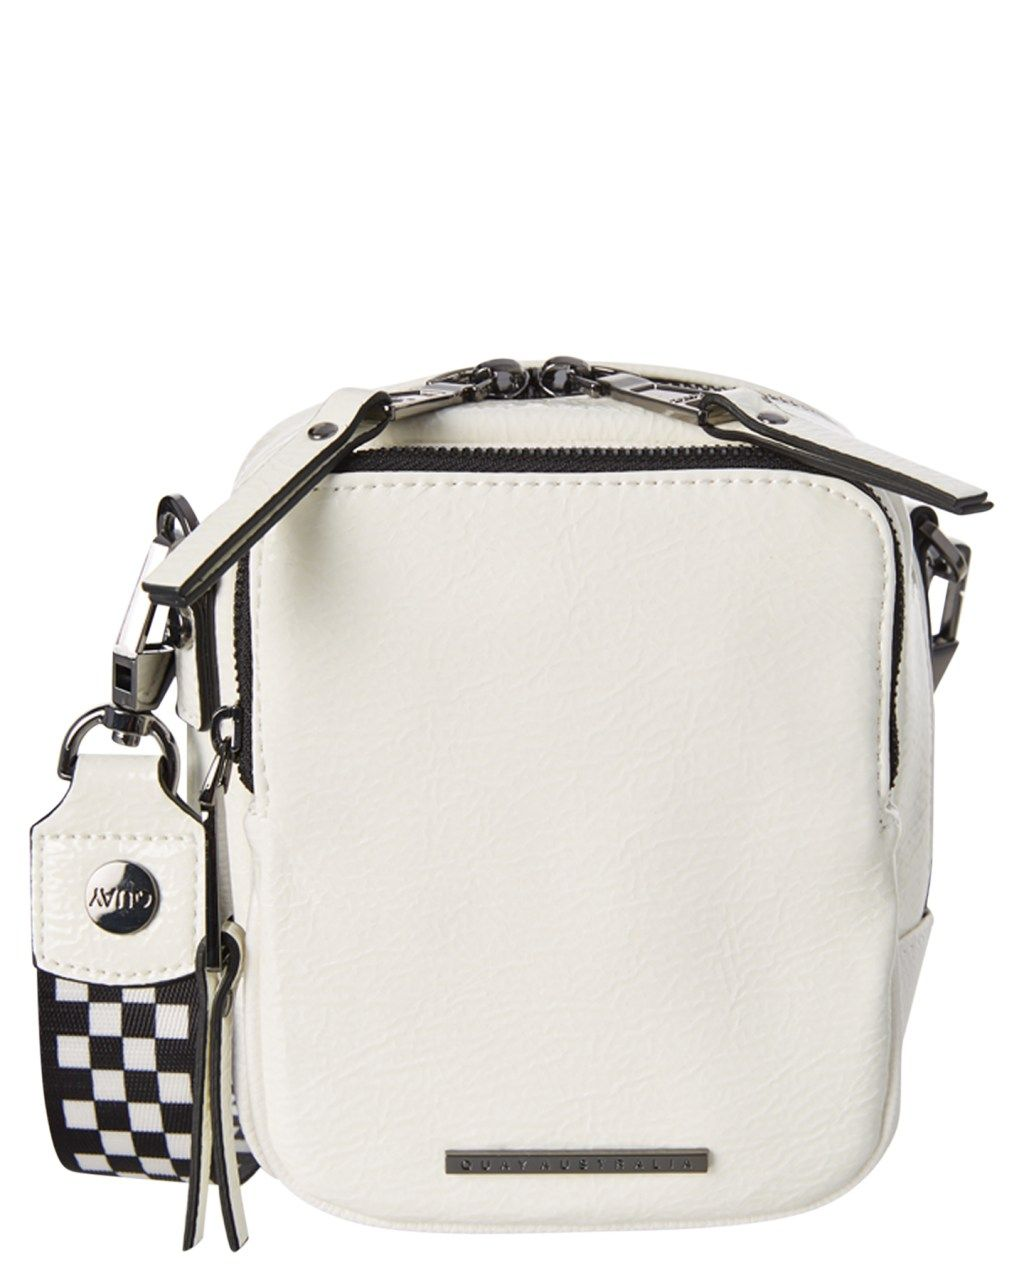 23c4abb51d Quay Eyewear Camera Bag White Gun Womens leisure bags Size   fashion ...